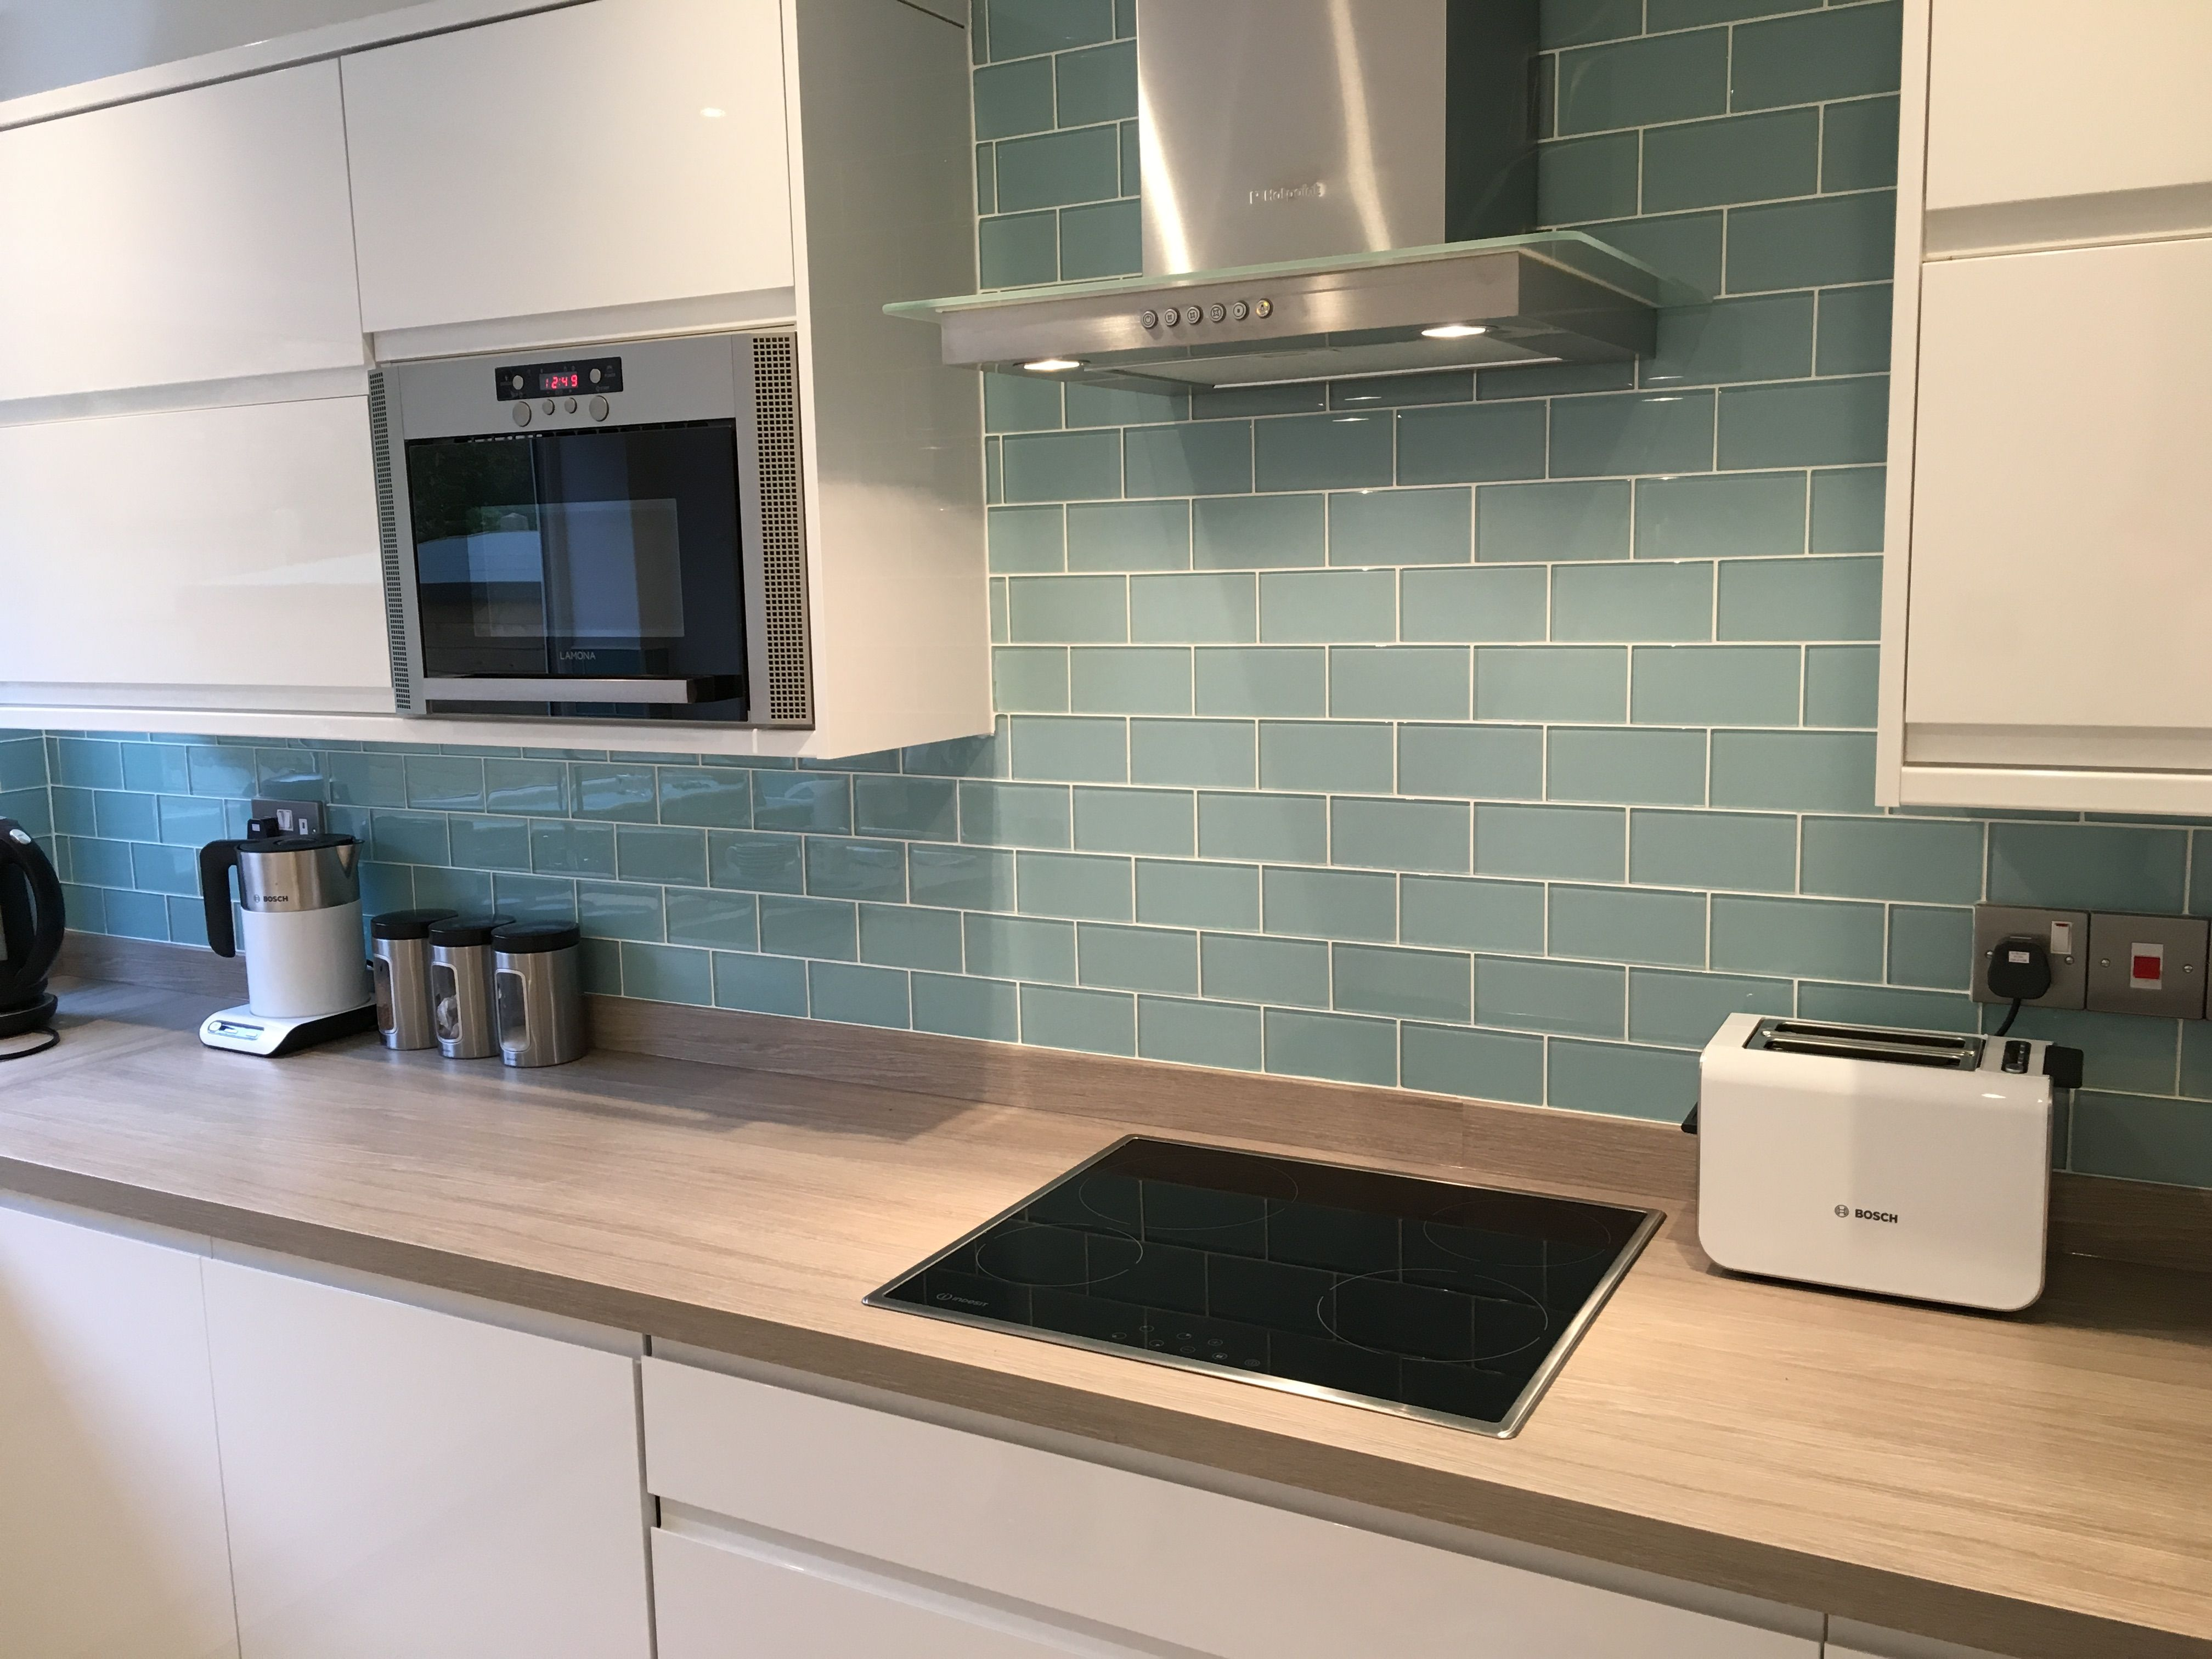 Kitchen Splashback Tiles Tile Design Ideas